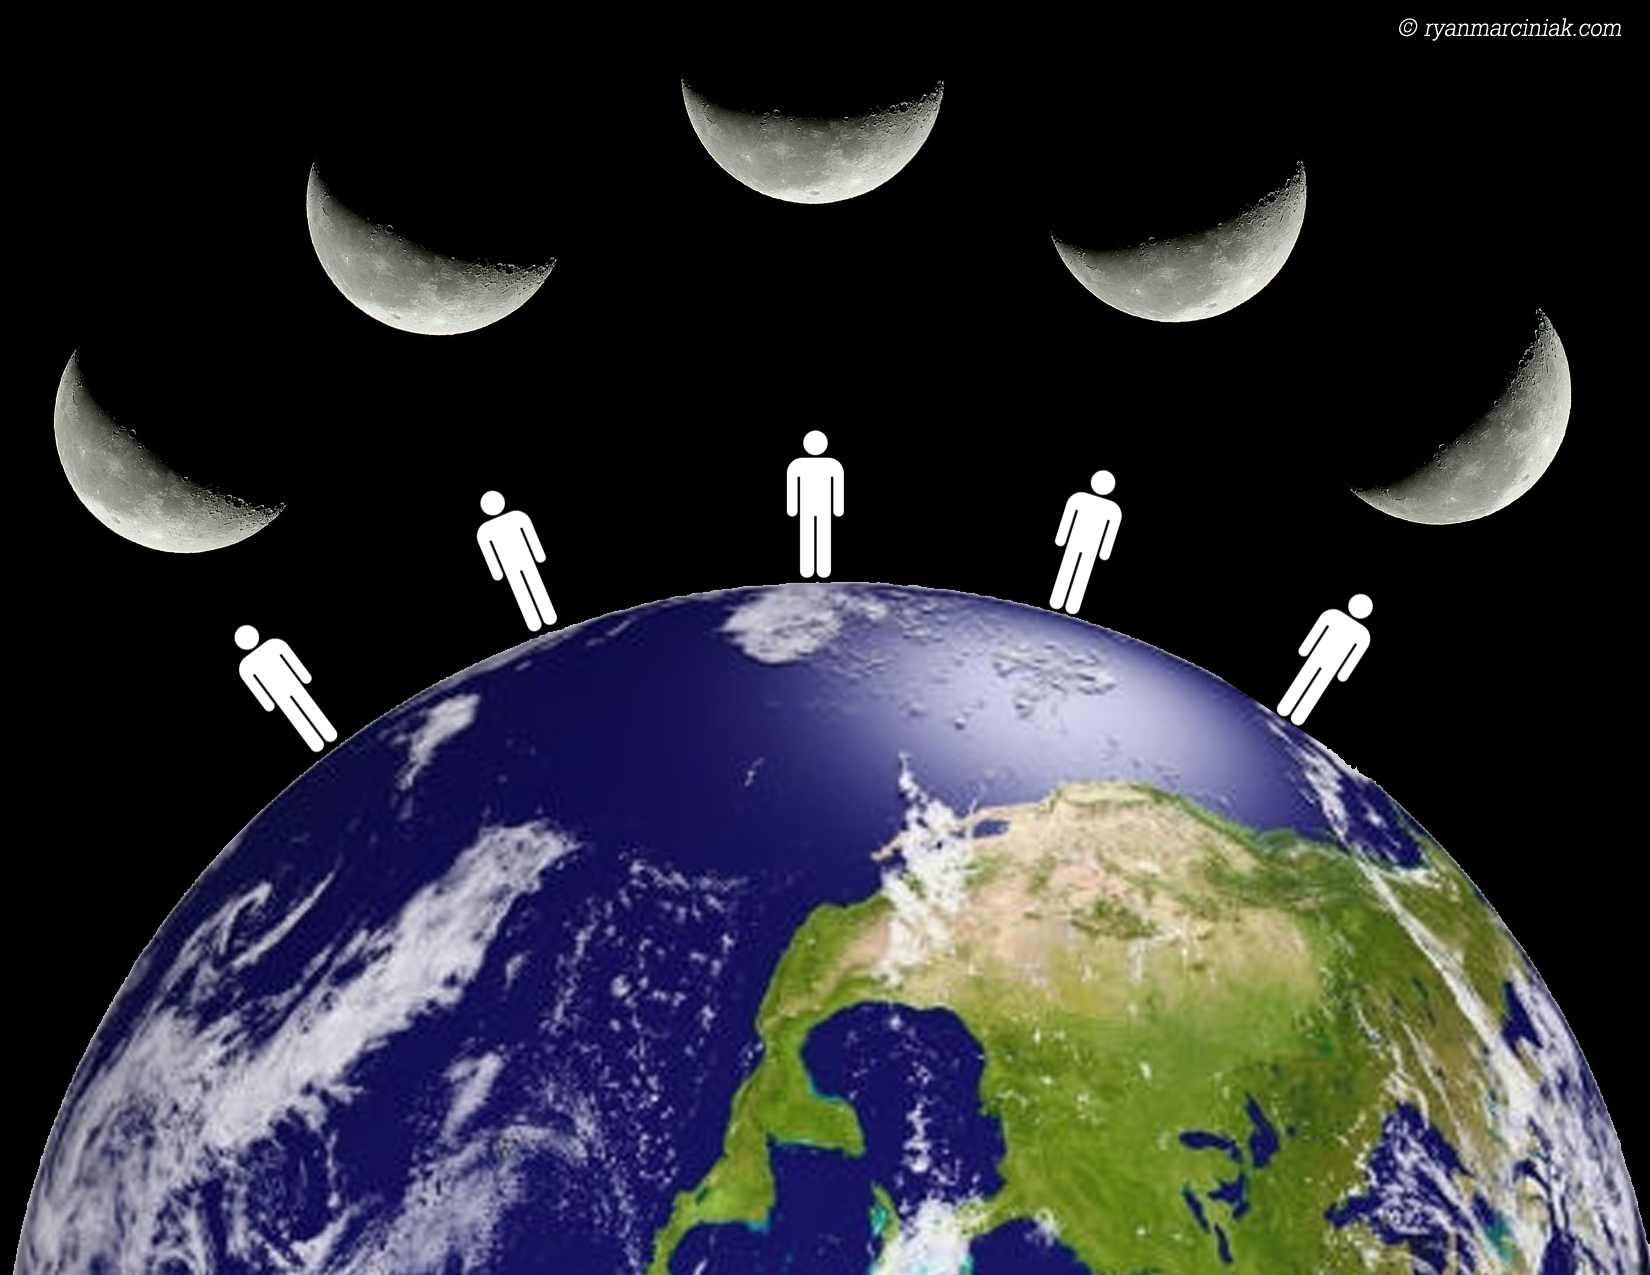 Moon-observer.jpg